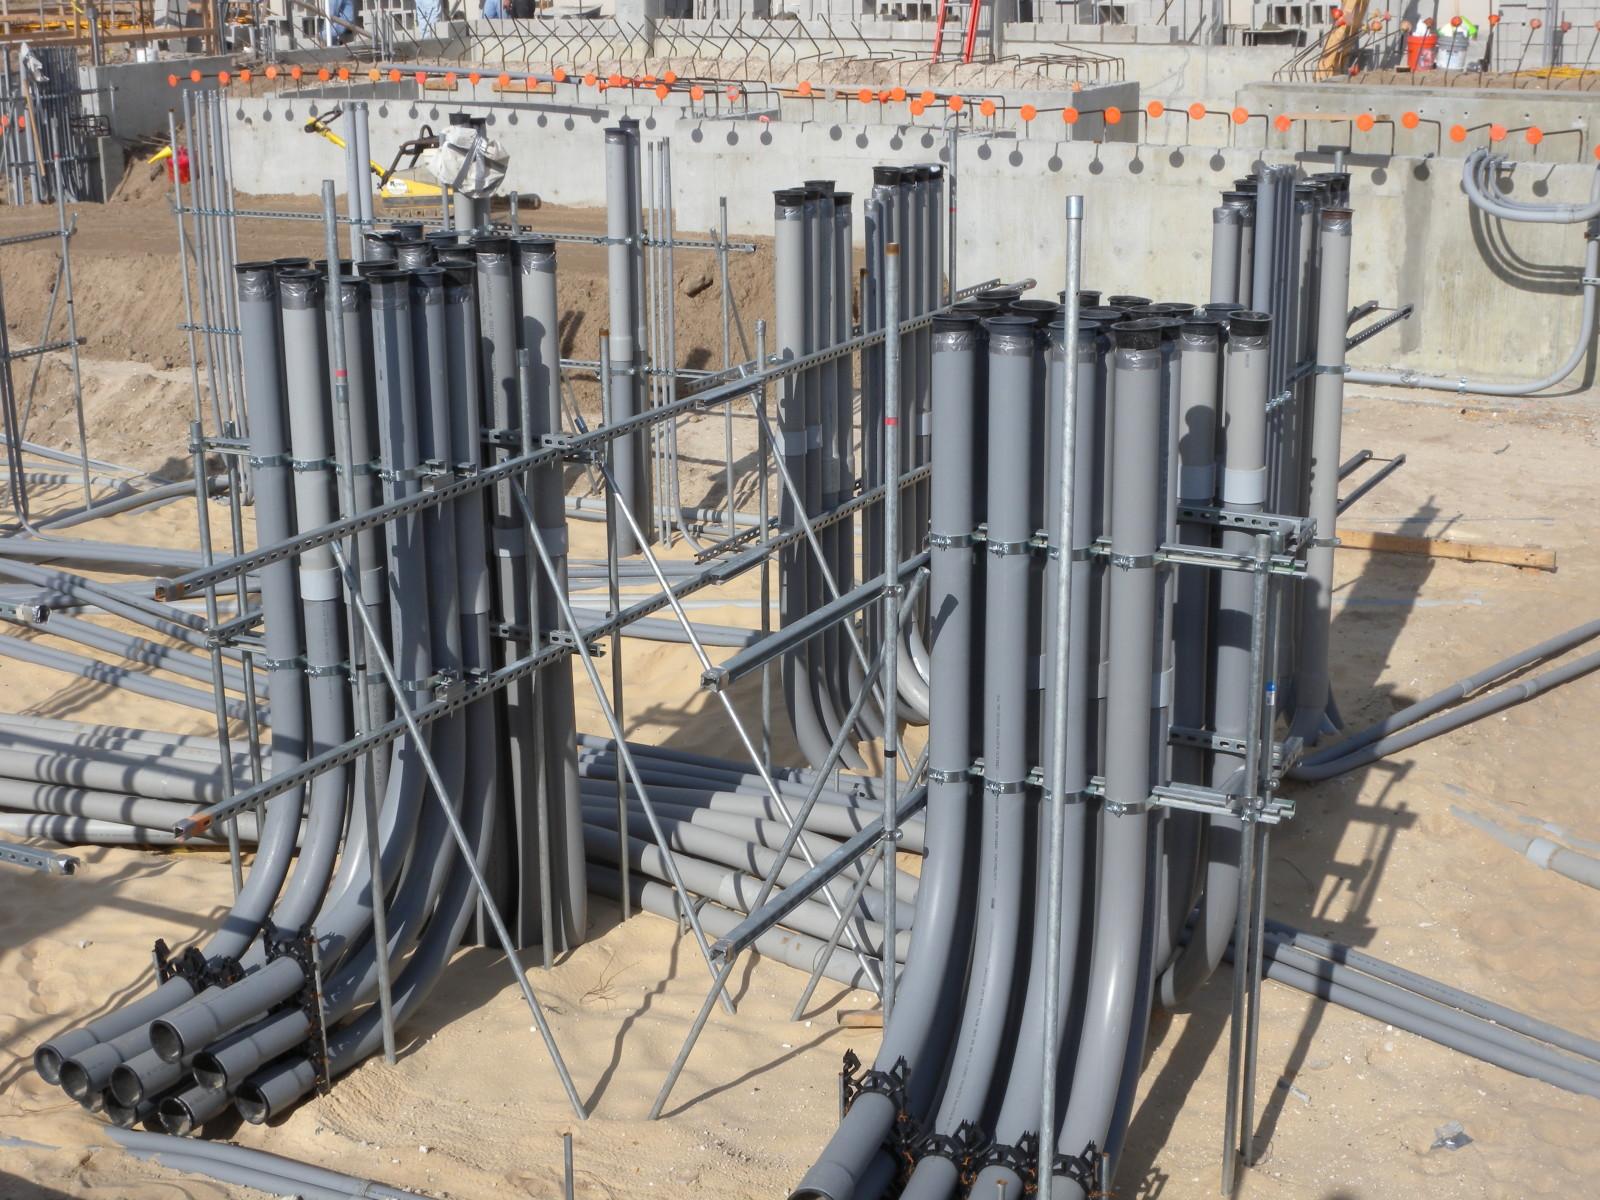 Incredible Underground Wiring Conduit Basic Electronics Wiring Diagram Wiring 101 Photwellnesstrialsorg